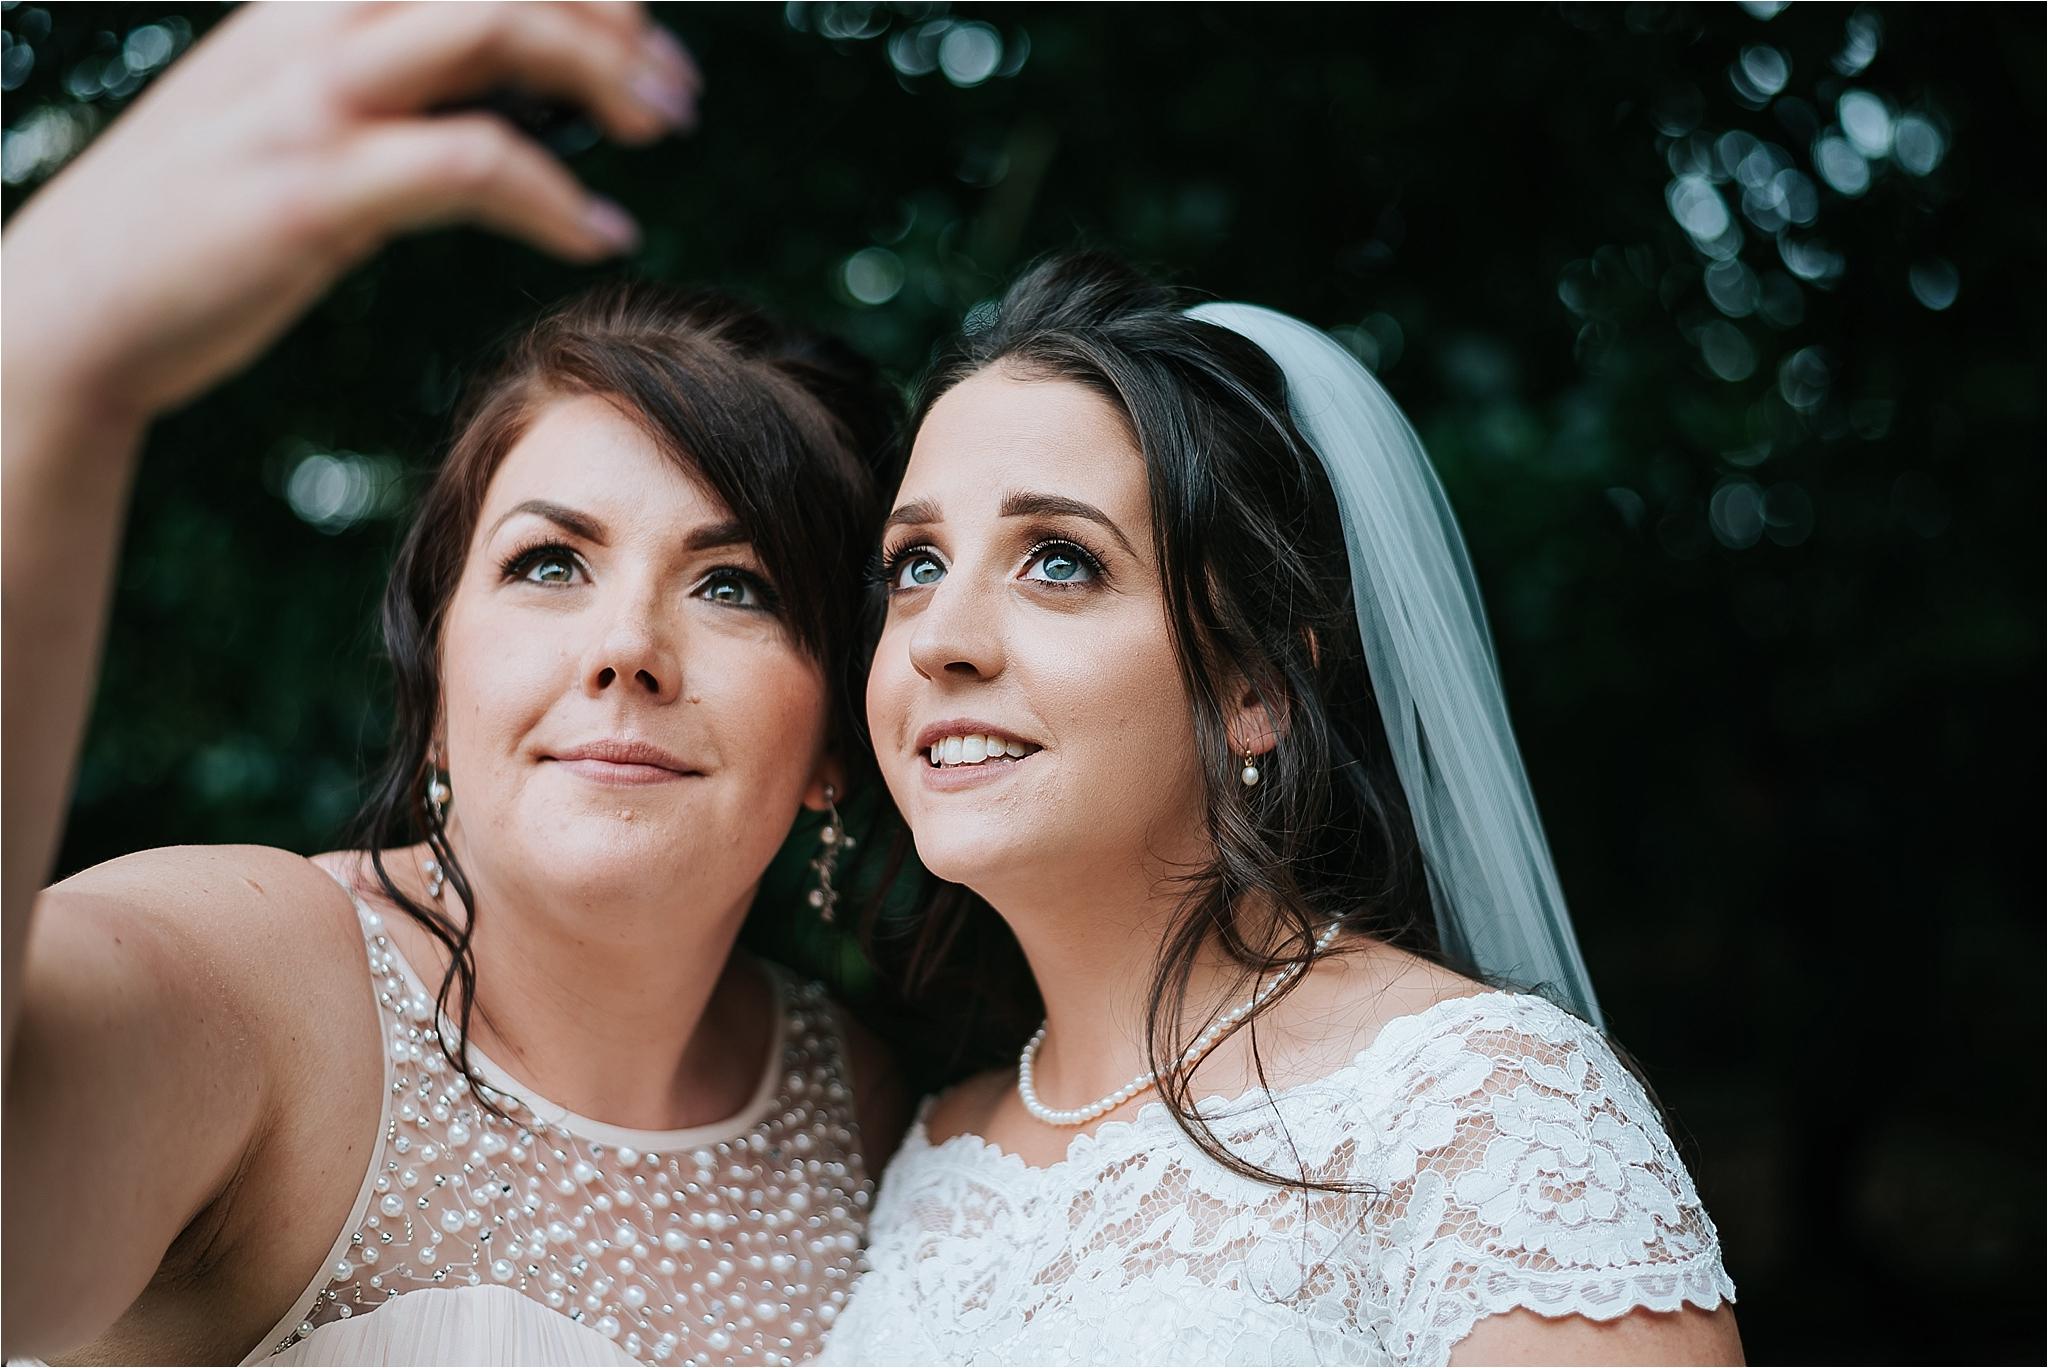 thevilla+lancashire+wreagreen+wedding+photographer36.jpg